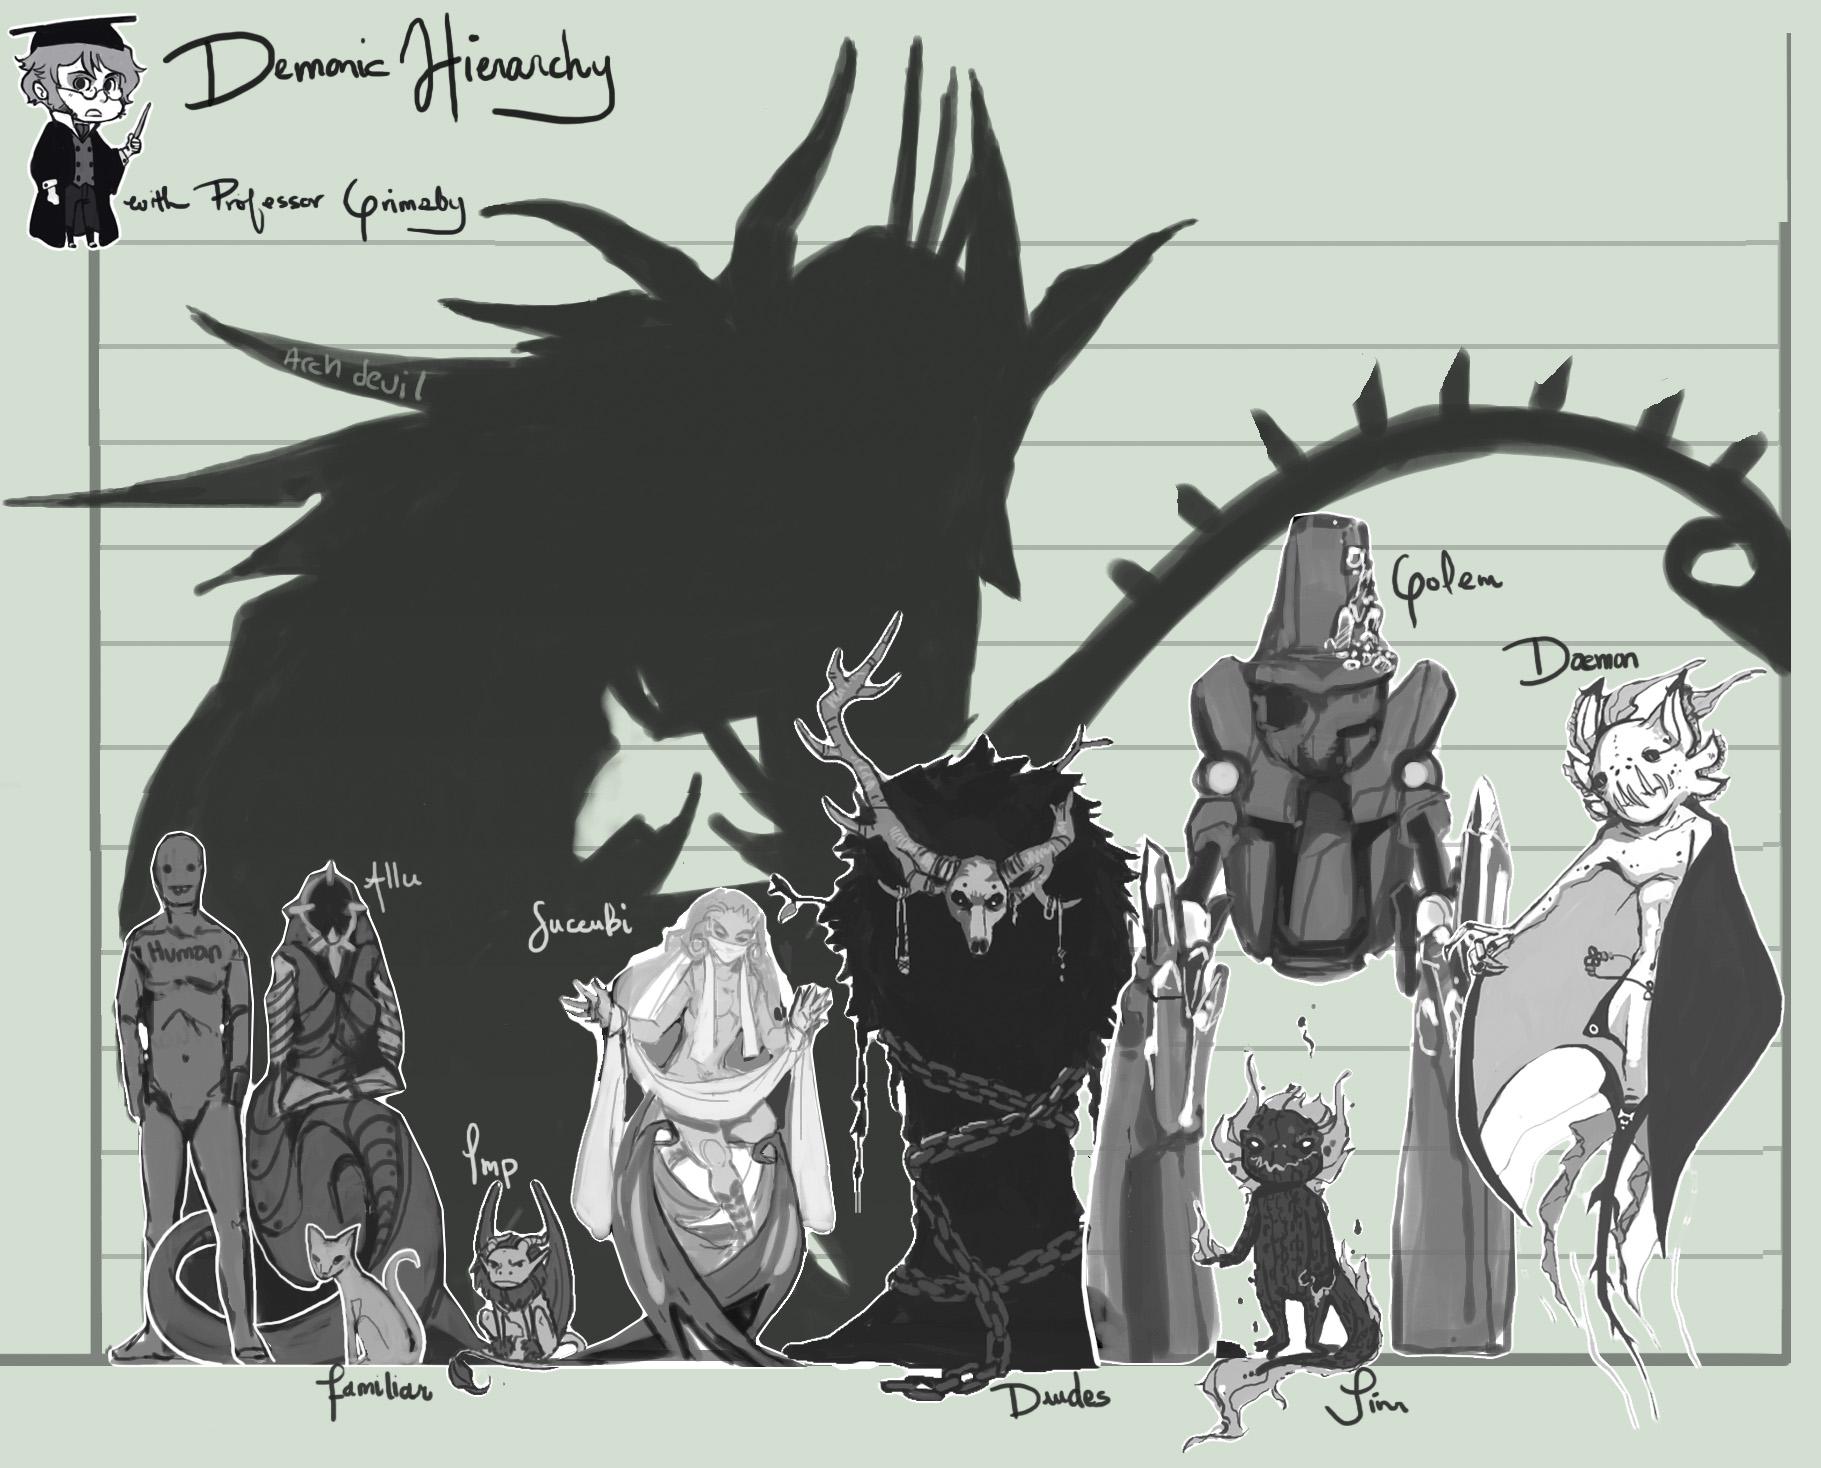 Demonology 101 by ianuae on DeviantArt